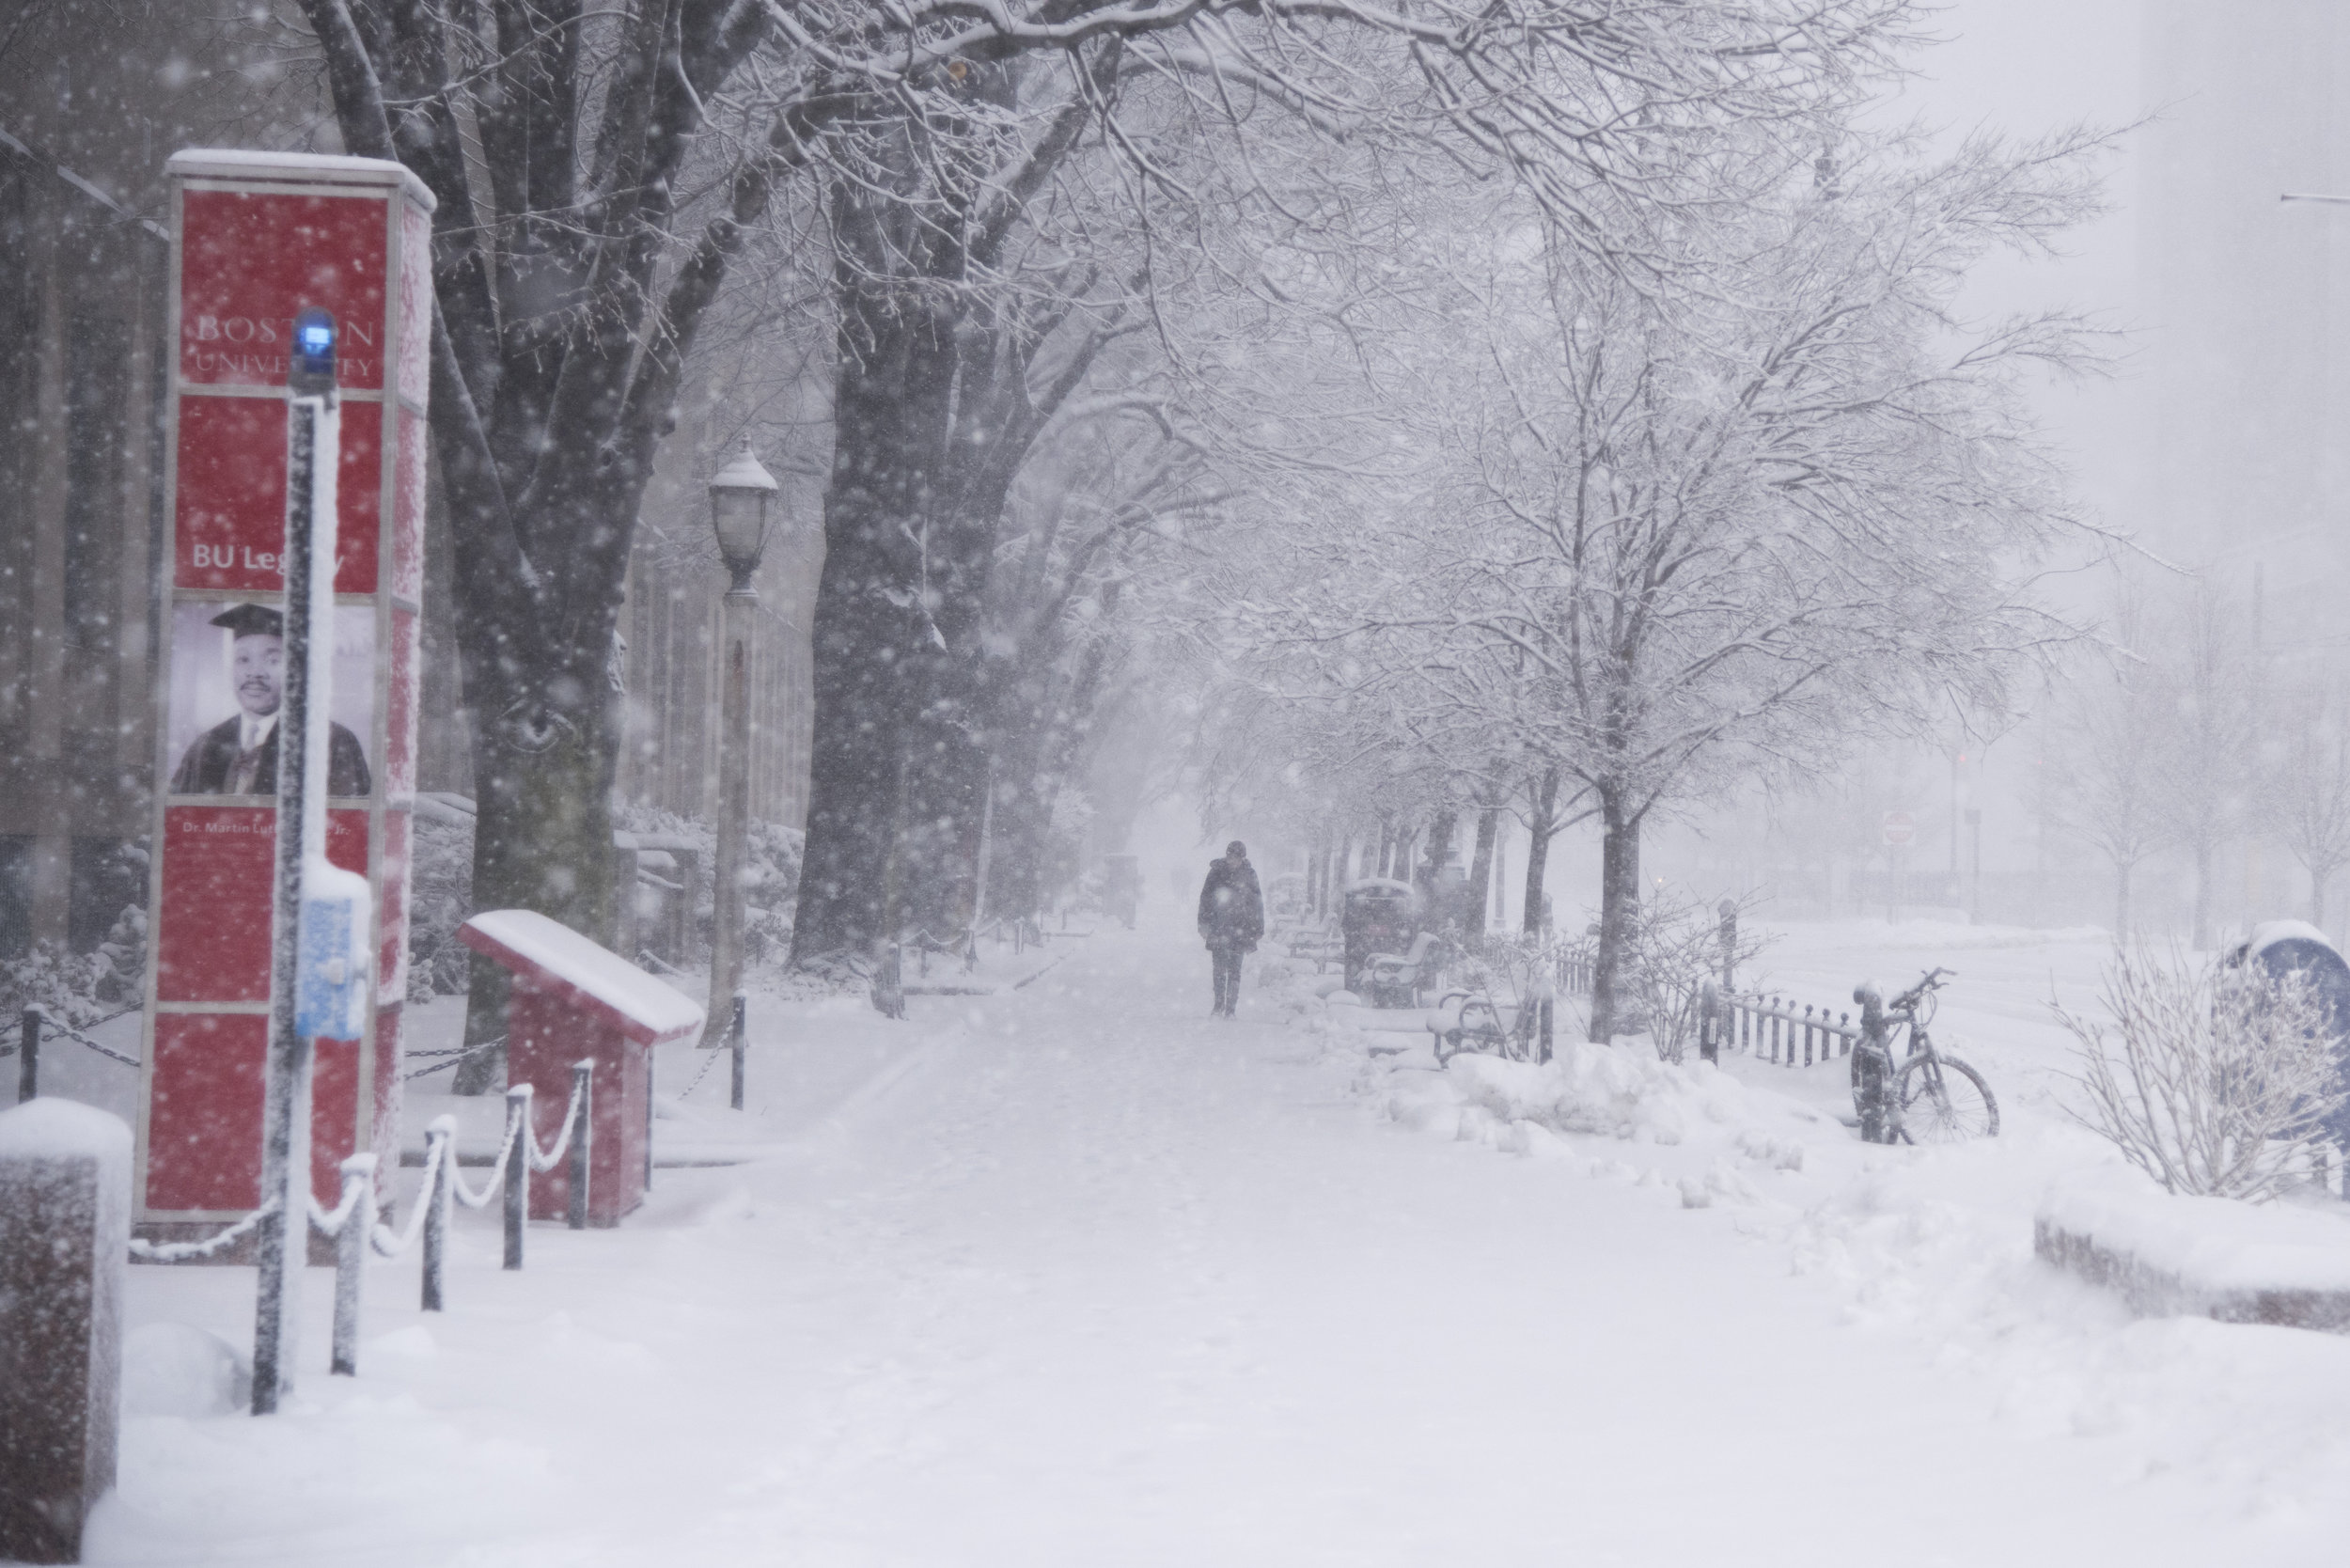 18-1198-SNOWMM-011.JPG